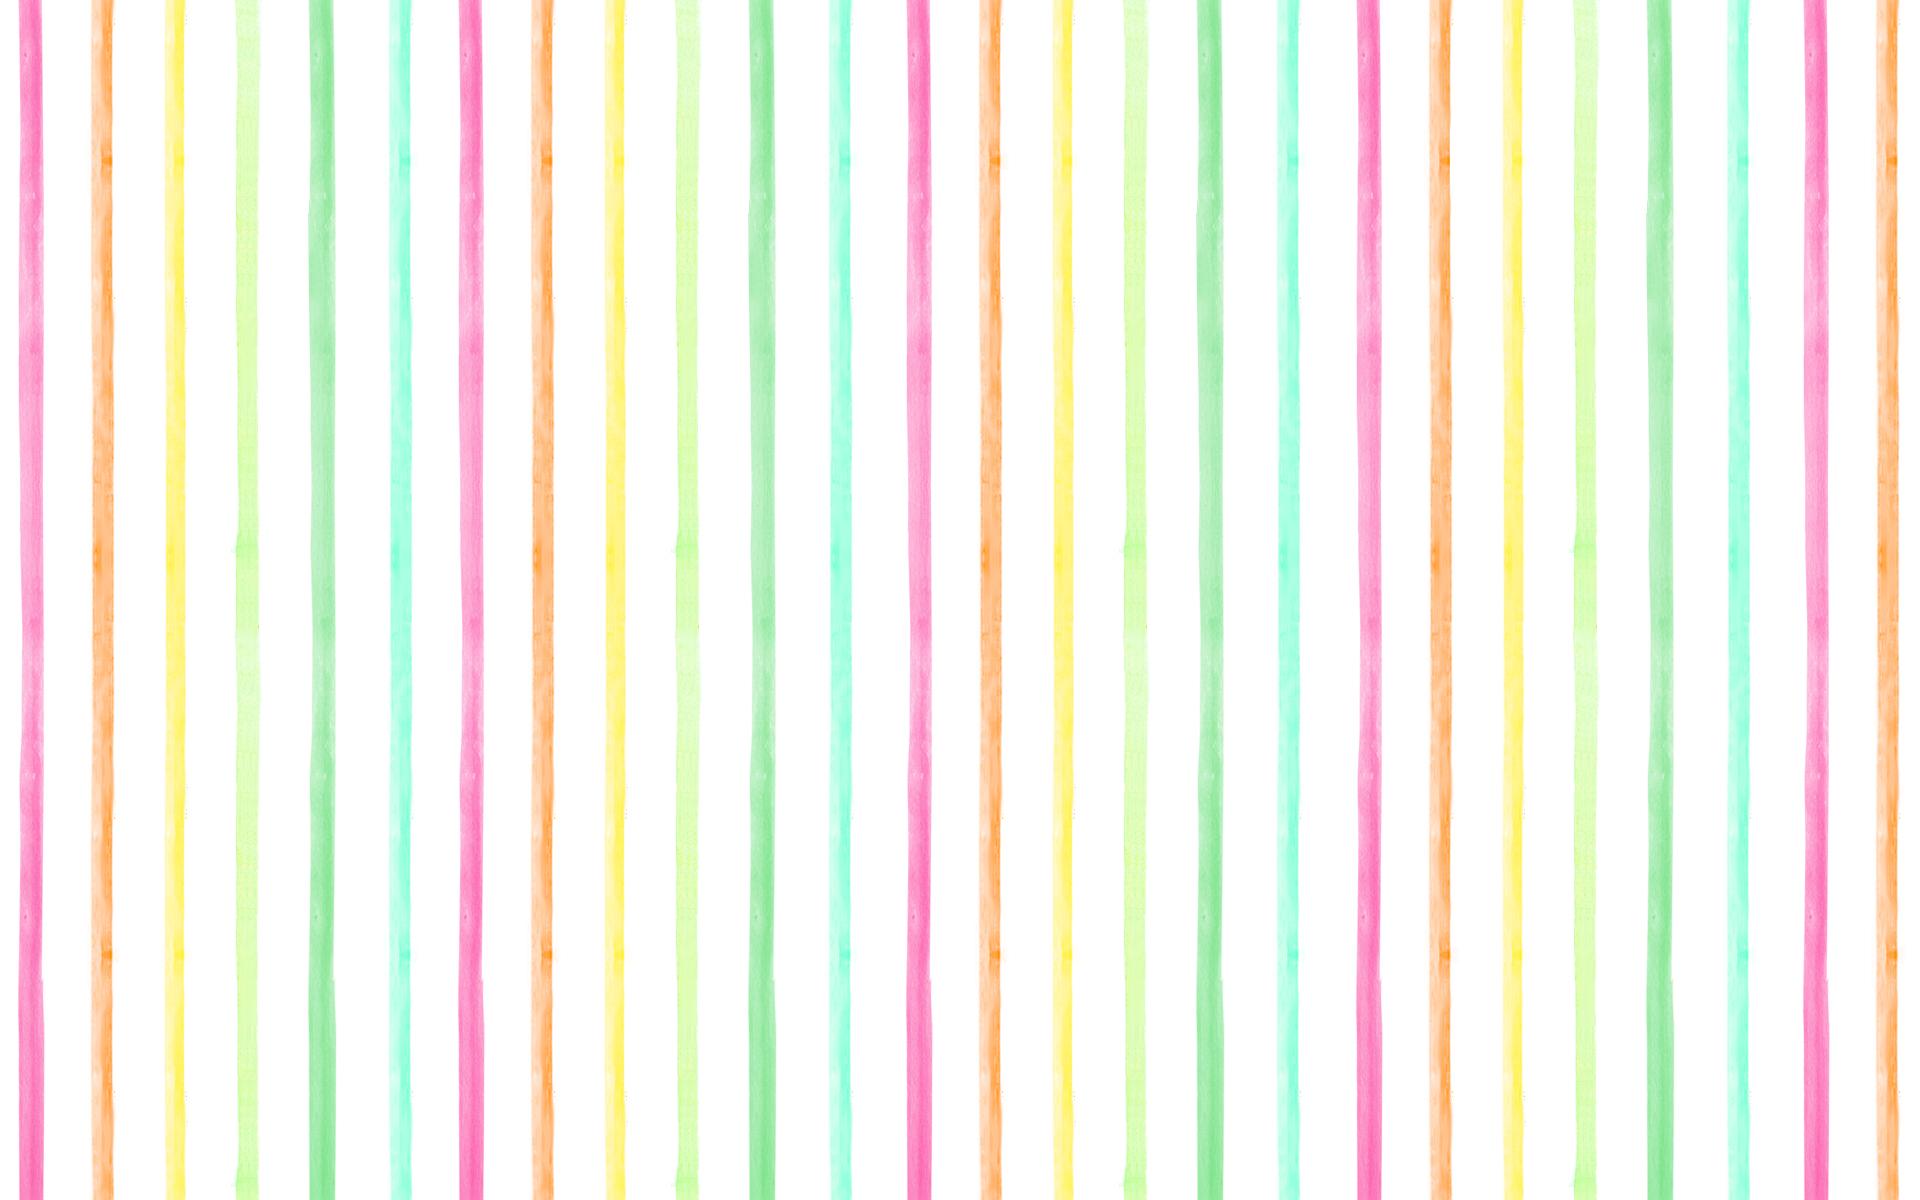 Pink And Blue Striped Wallpaper 2989 Wallpaper: Chic Desktop Wallpaper